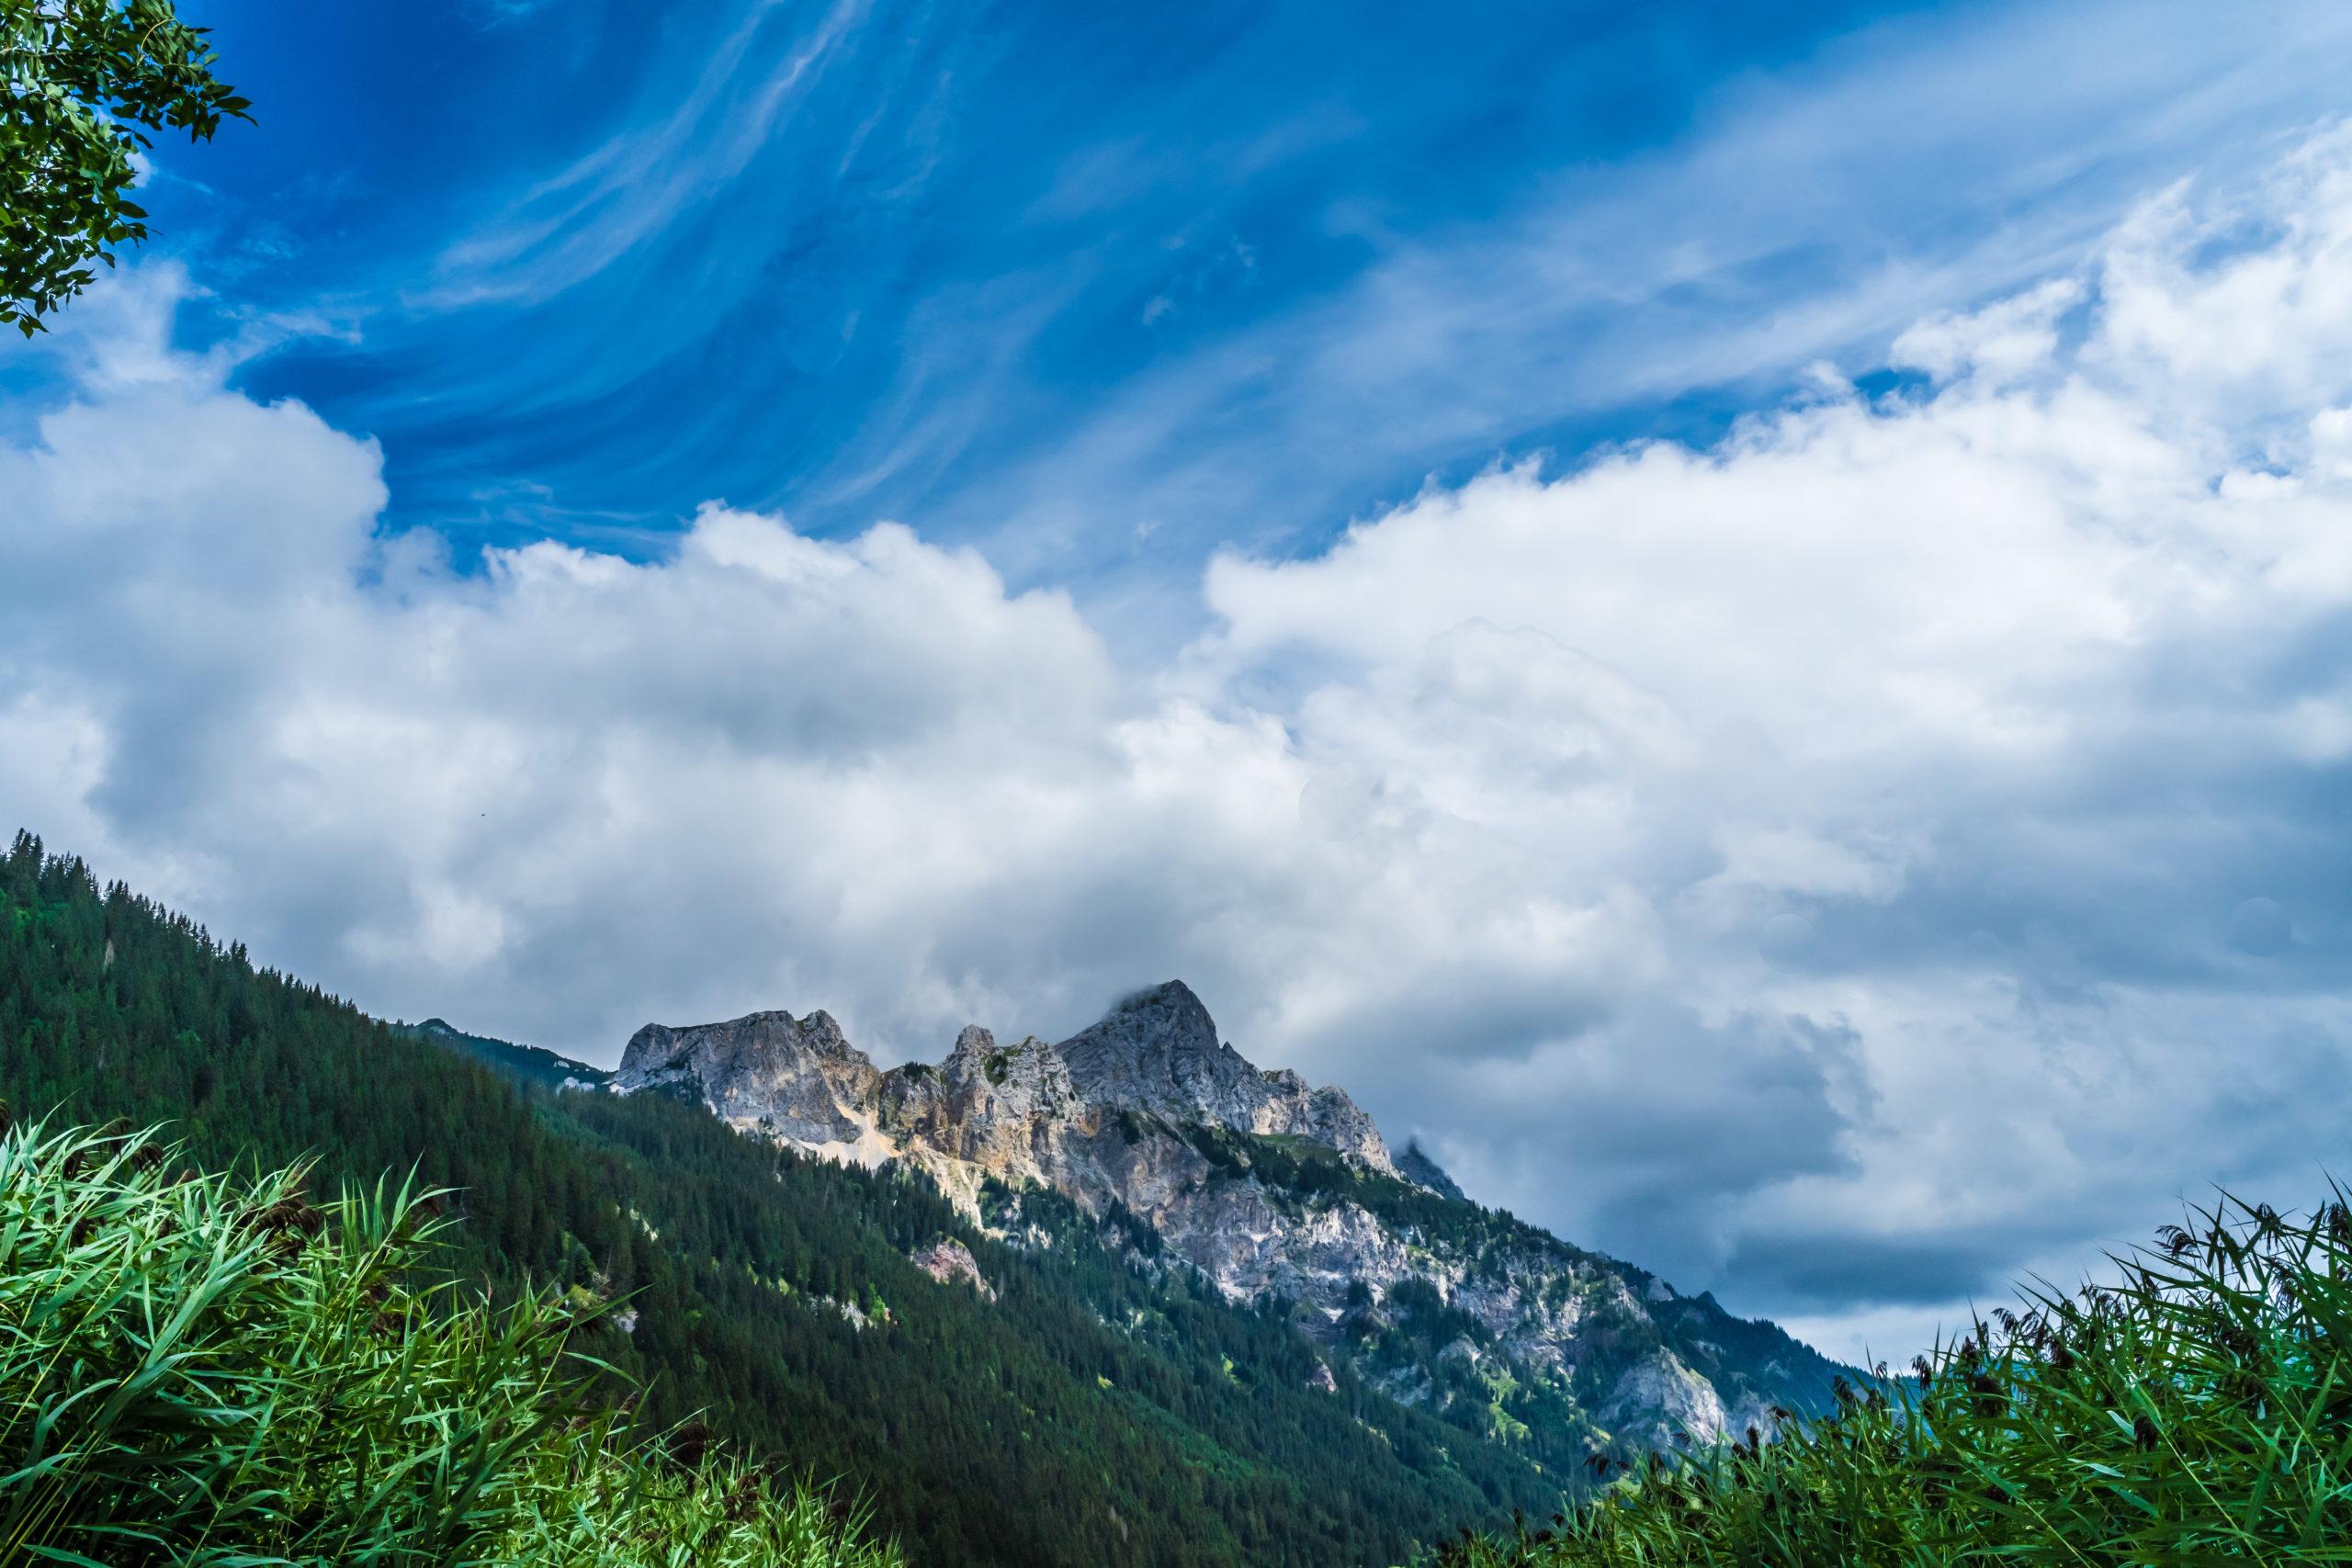 Tirol, Tannheimer Tal